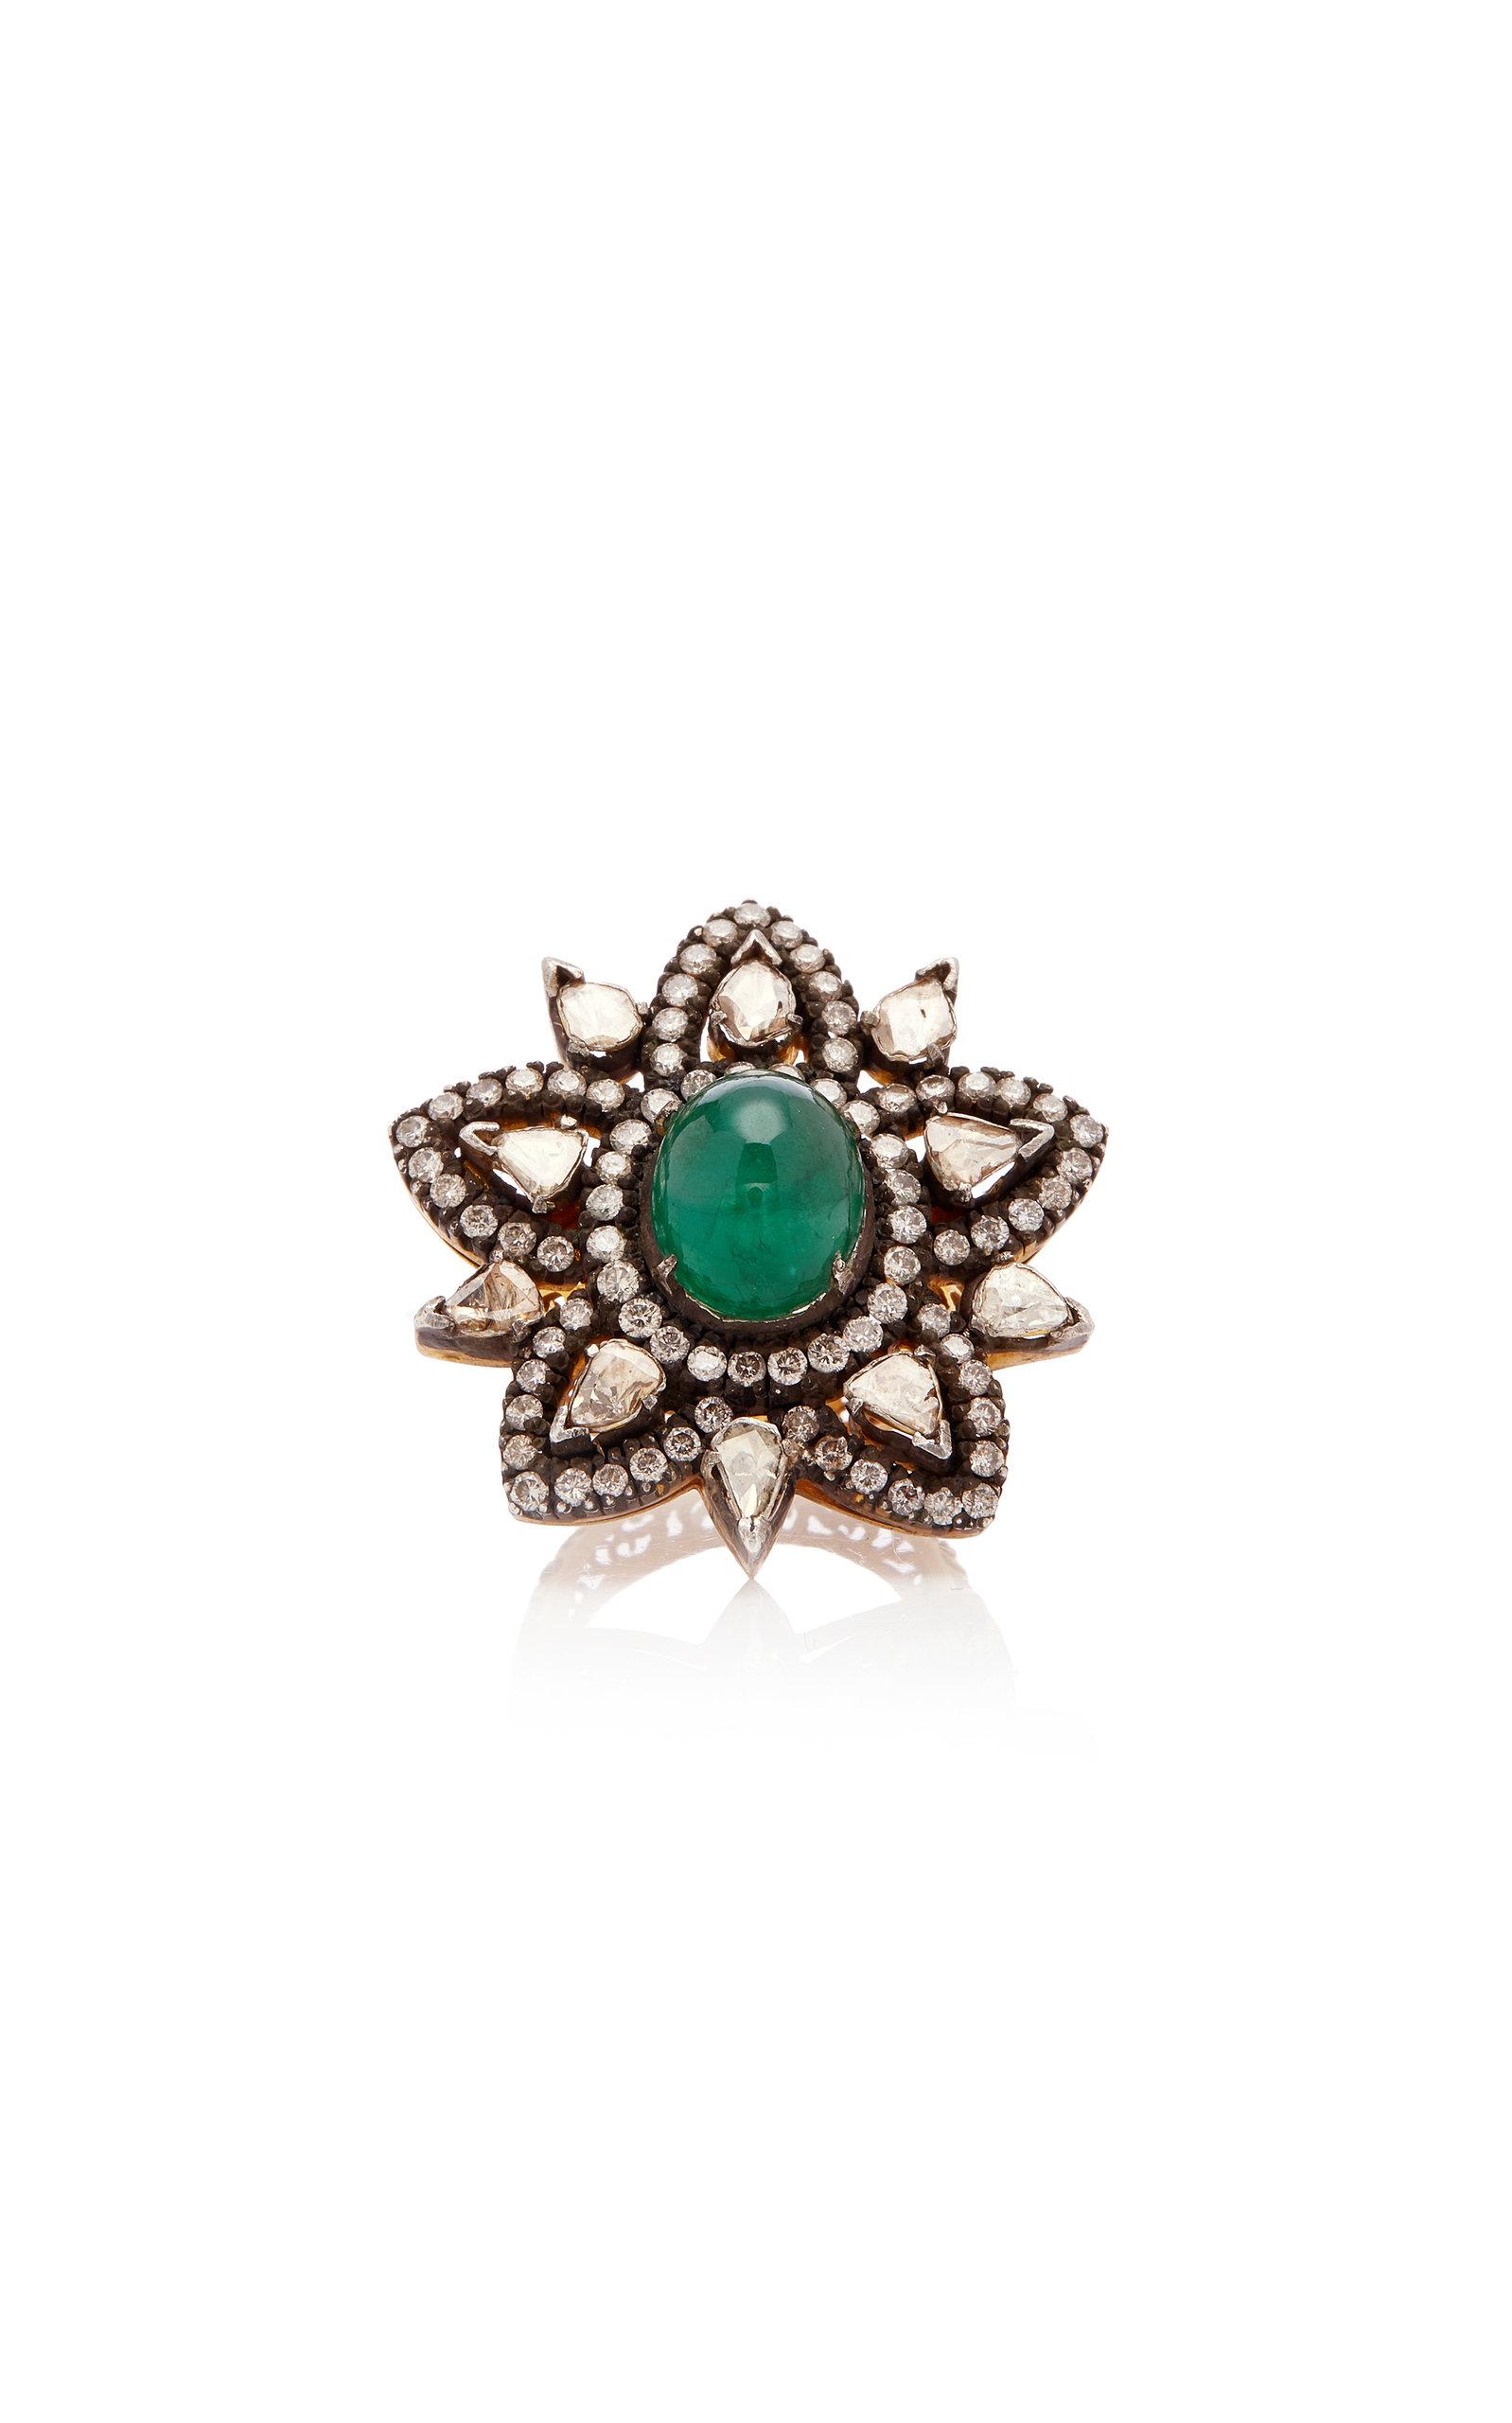 Women's 14K Gold; Emerald And Diamond Ring